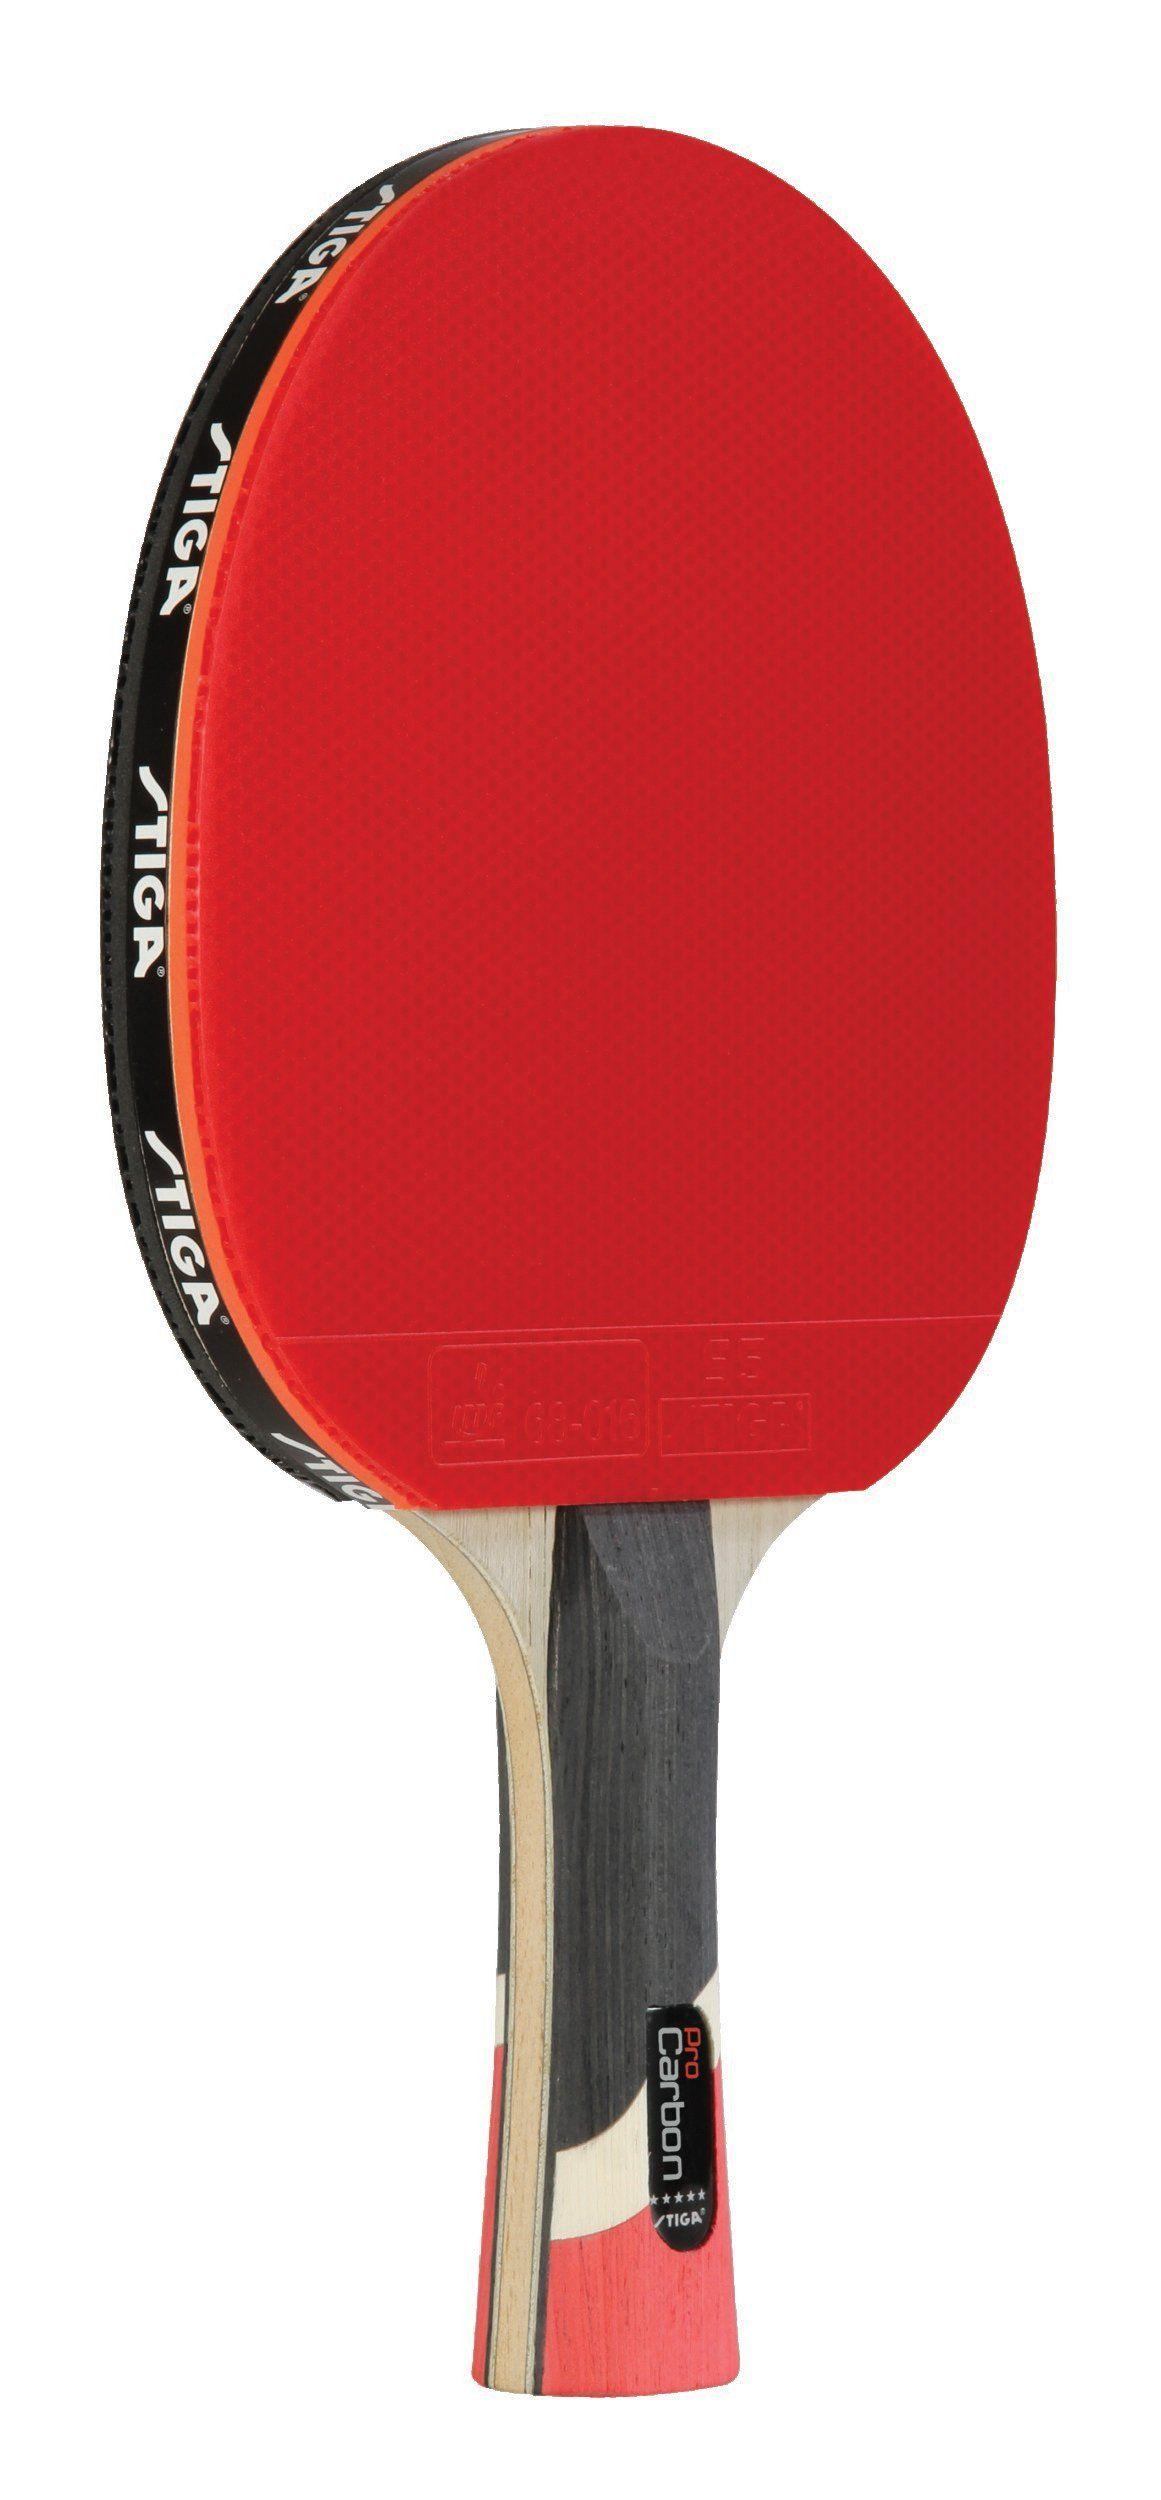 STIGA Pro Carbon Table Tennis Racket Table tennis racket